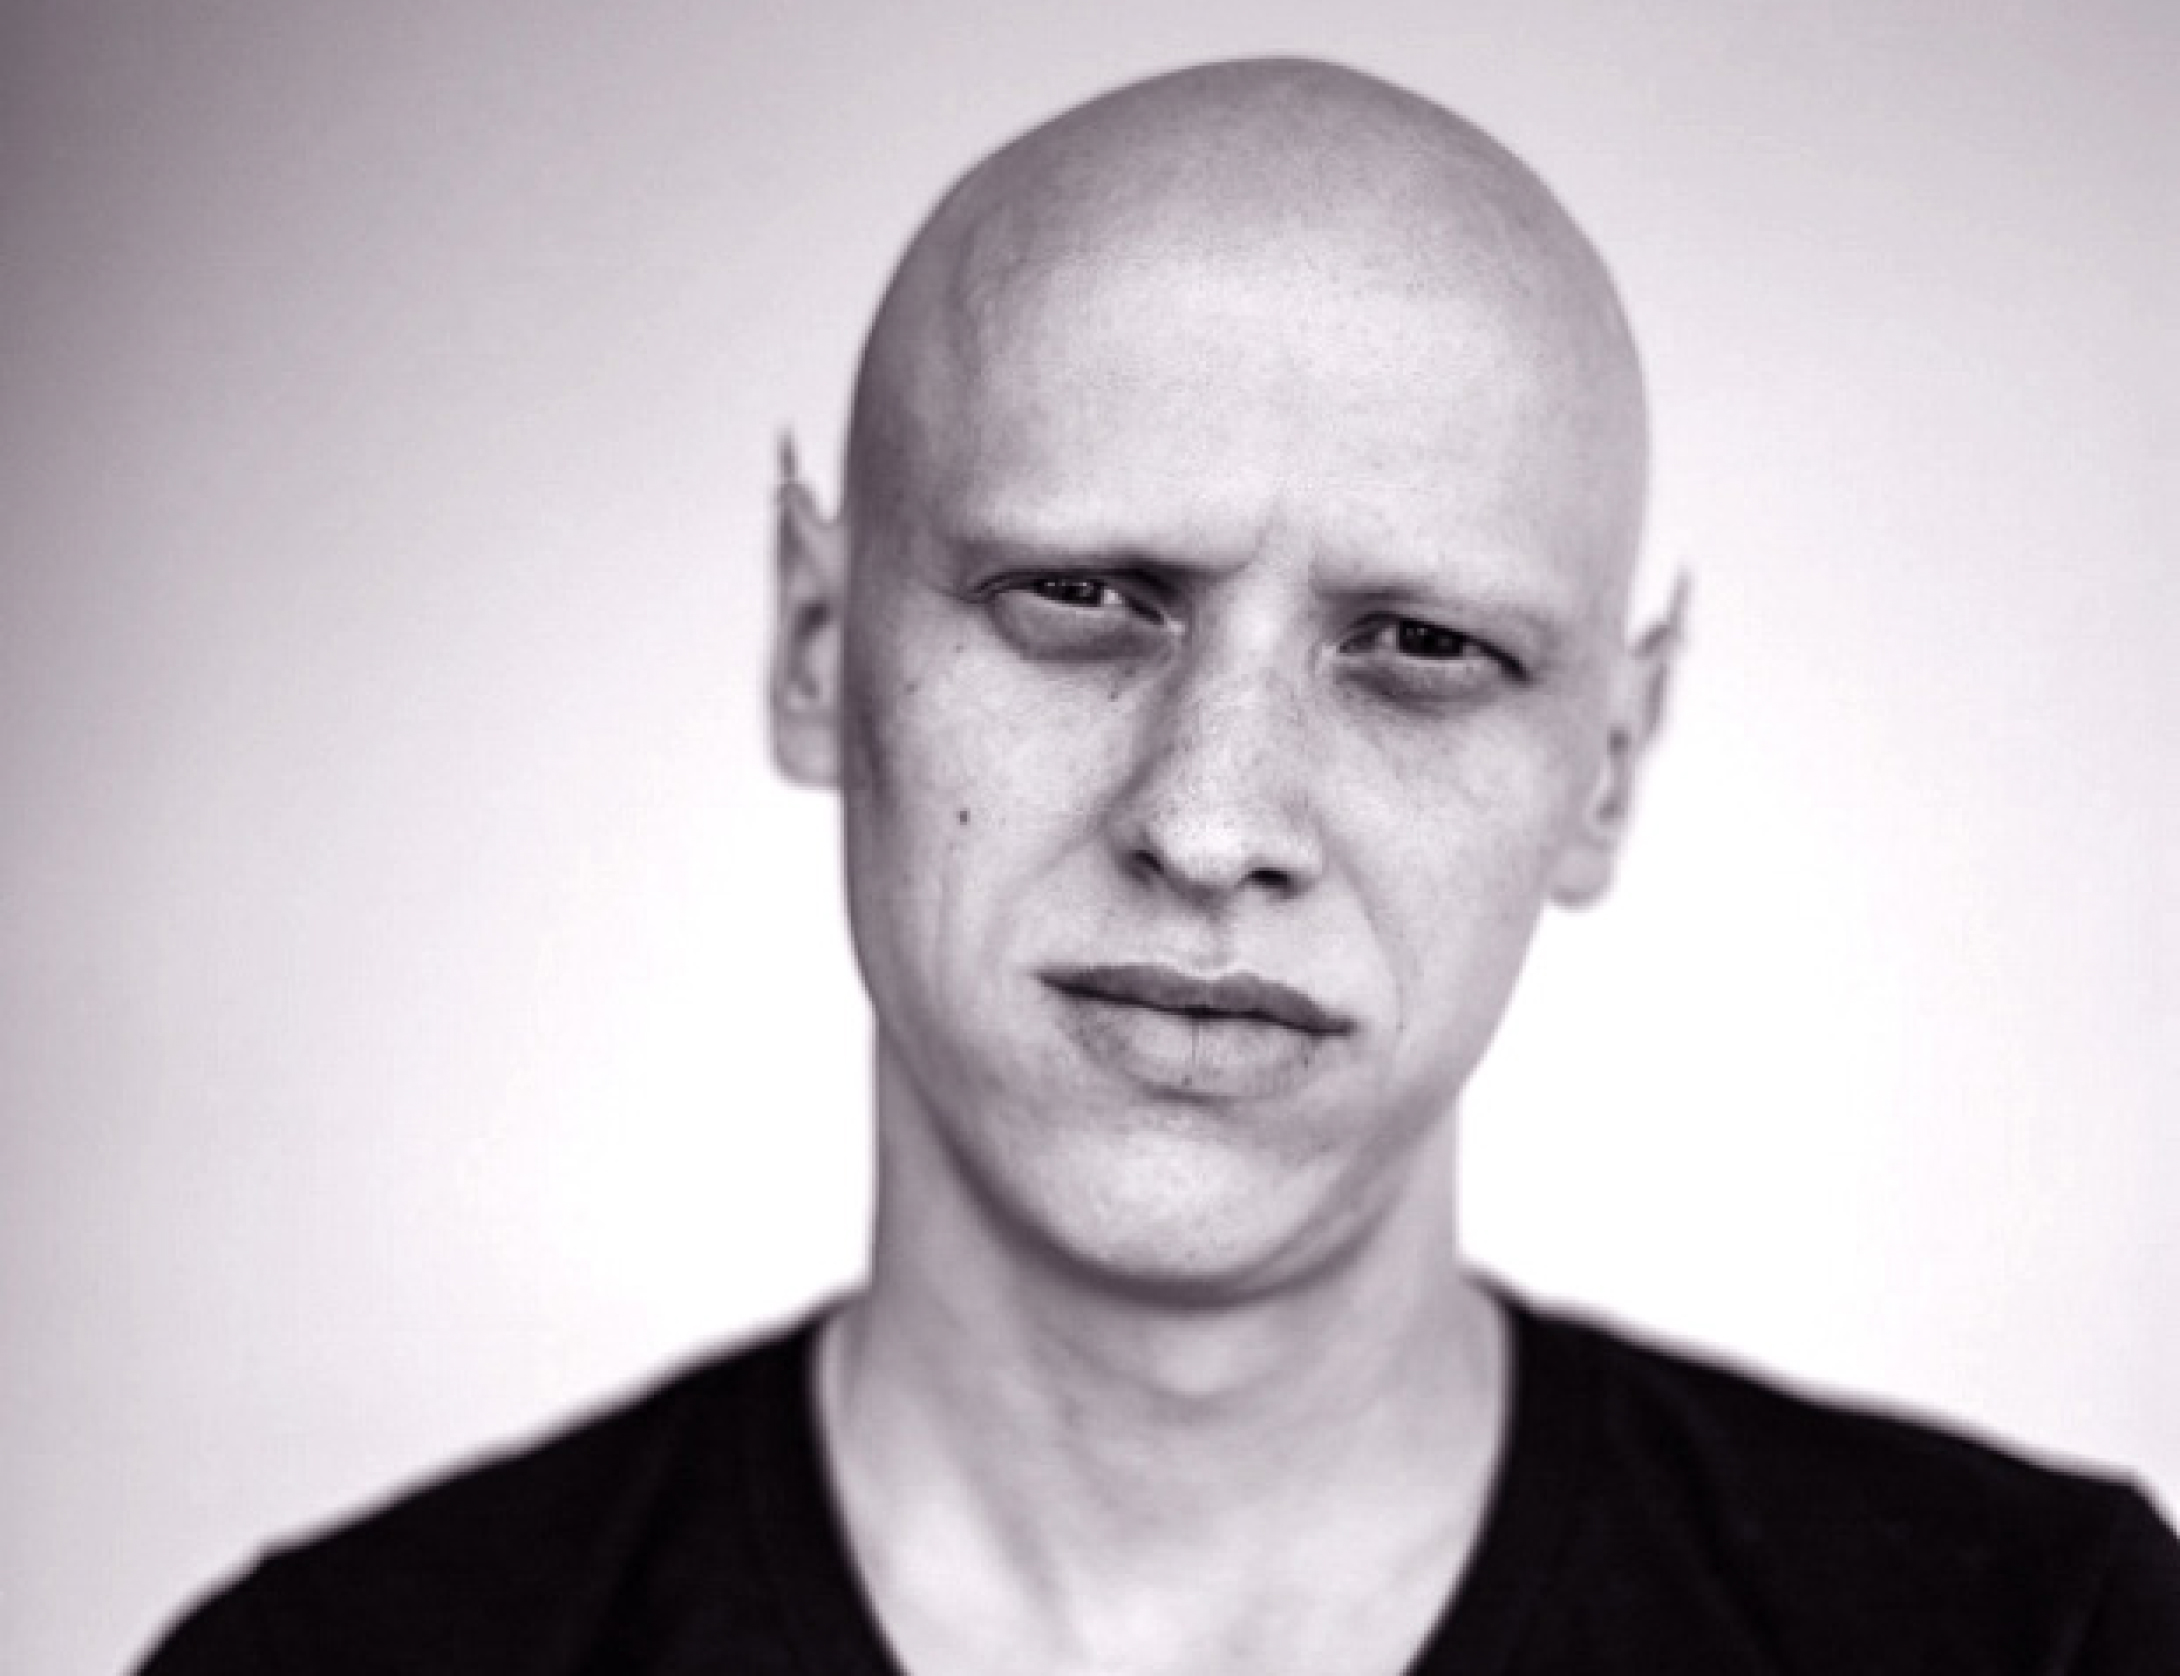 "丹尼尔·弗兰克  丹尼尔·弗兰克,德国卡尔斯鲁厄国立设计学院(Karlsruhe University of Arts and Design)媒体艺术系助教,德国魏玛包豪斯大学(The Bauhaus-Universität Weimar)的博士候选人,""电子艺术与表演实验室"" (Lab for Electronic Arts and Performance) 的创始人之一。  Daniel Franke  Daniel Franke is teaching at Karlsruhe University of Arts and Design. He is the Doctoral candidate of The Bauhaus-Universität Weimar, also is one of the founders of LEAP (Lab for Electronic Arts and Performance)."